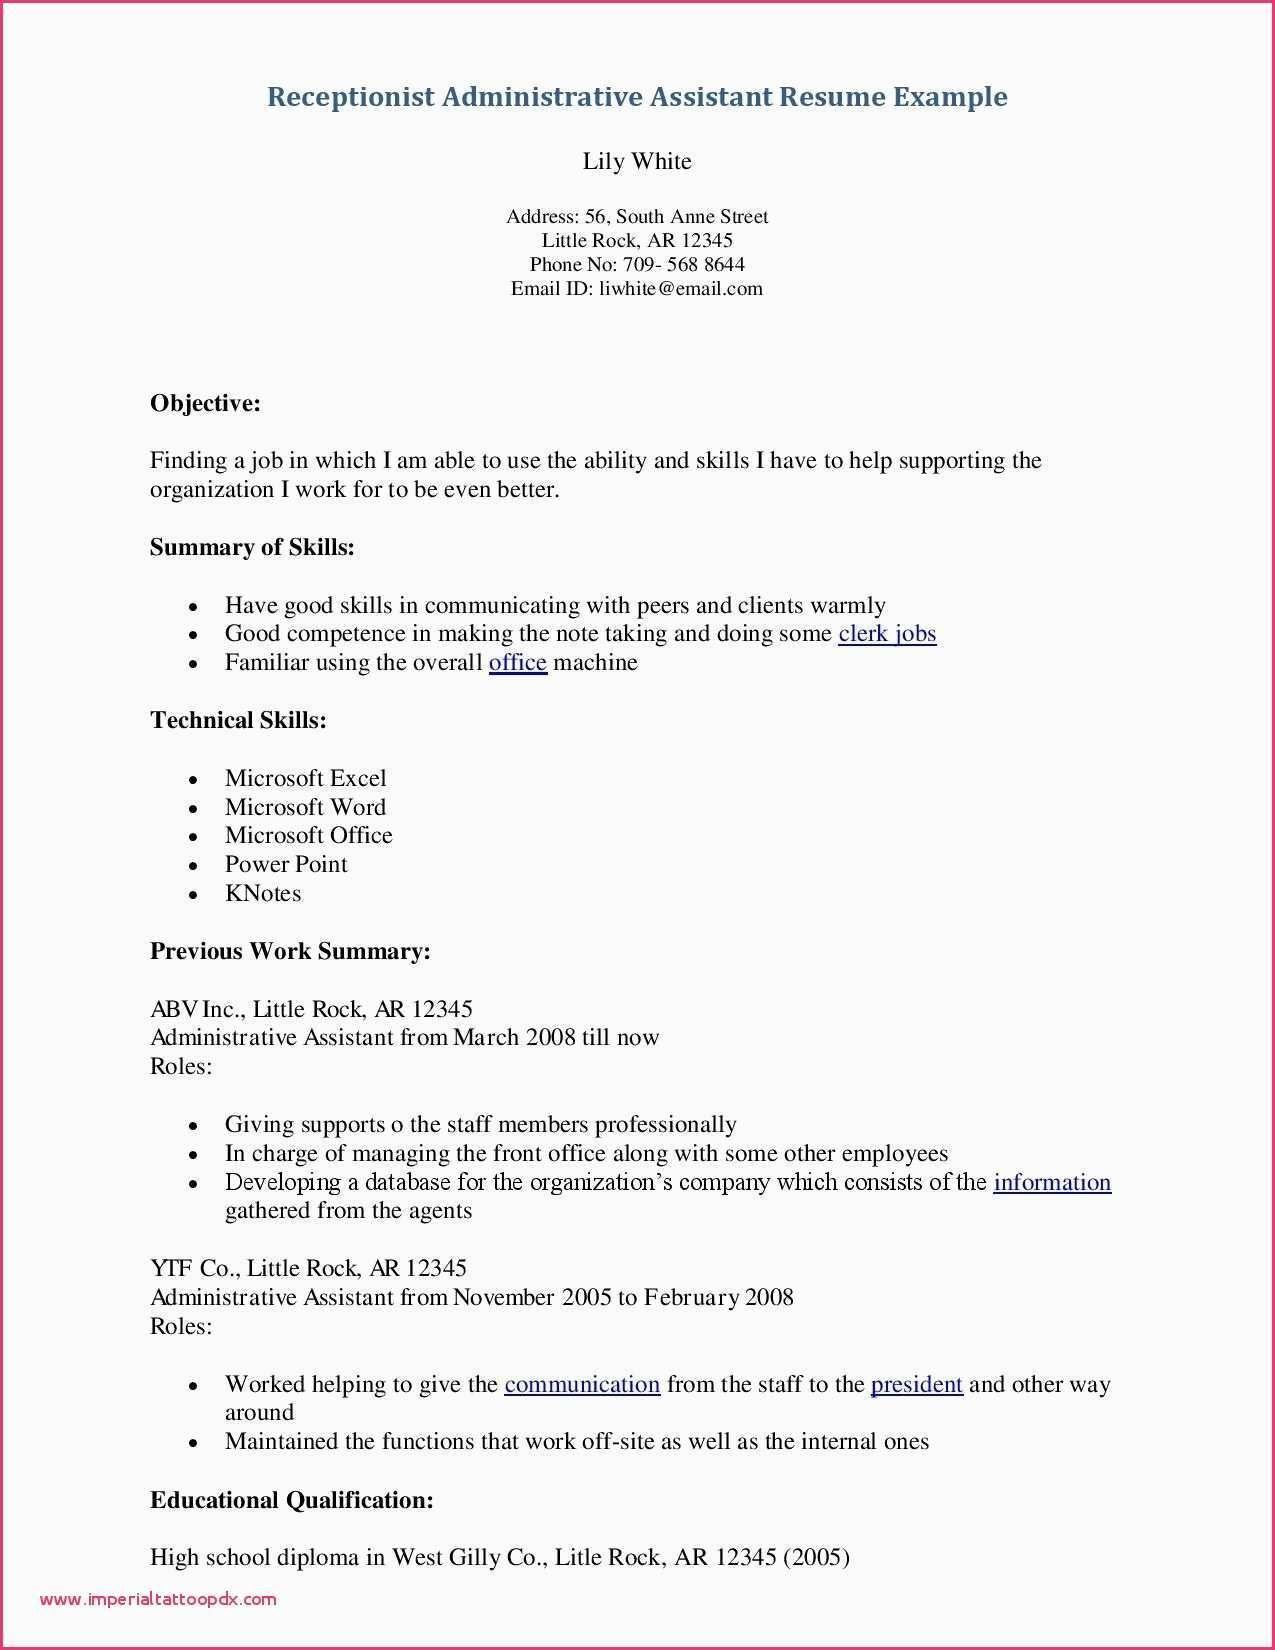 Pin on Resume templates